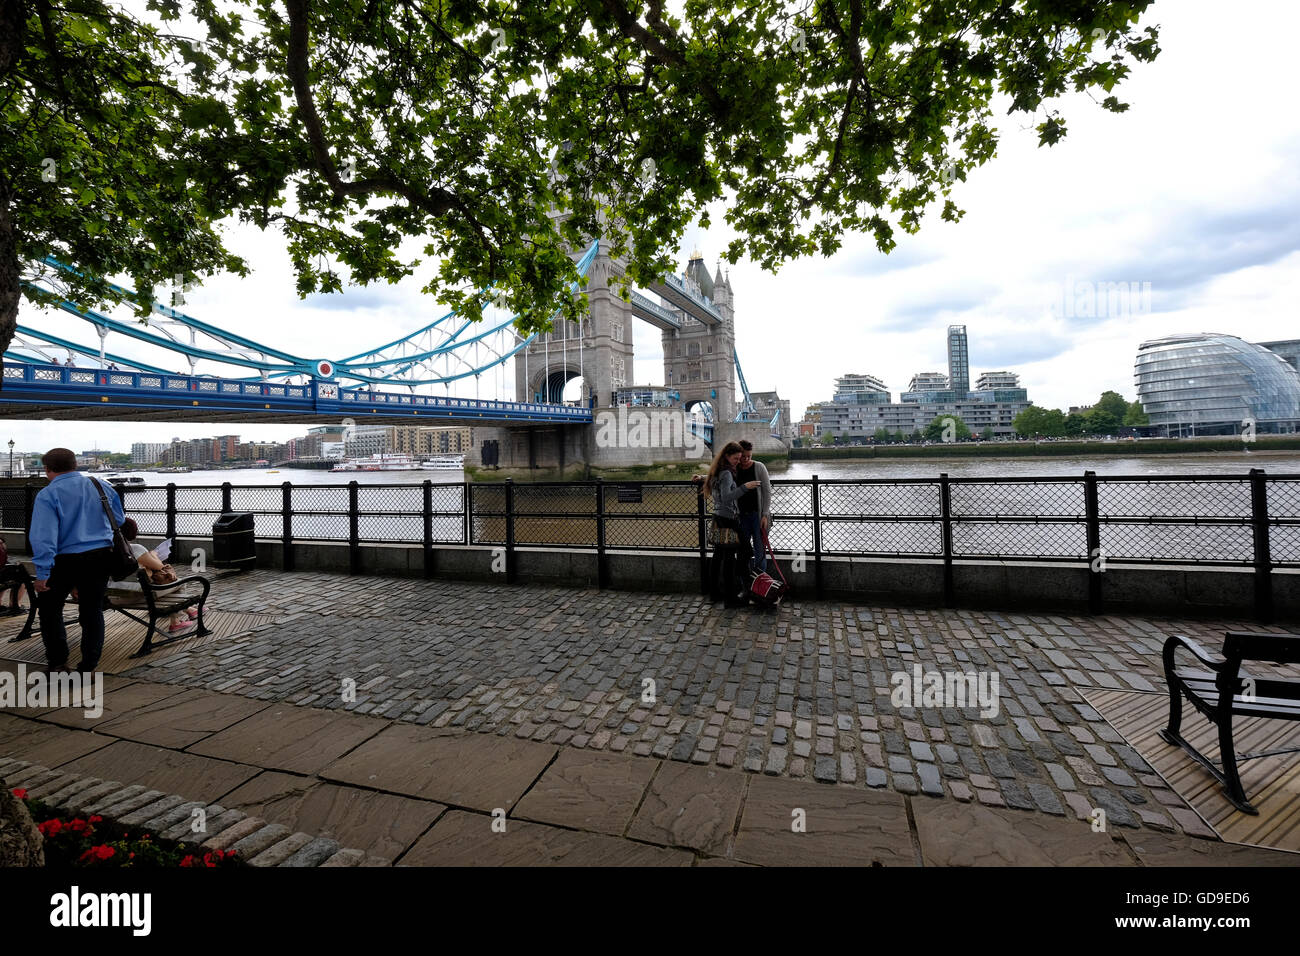 Tower Bridge from Victoria Embankment - Stock Image